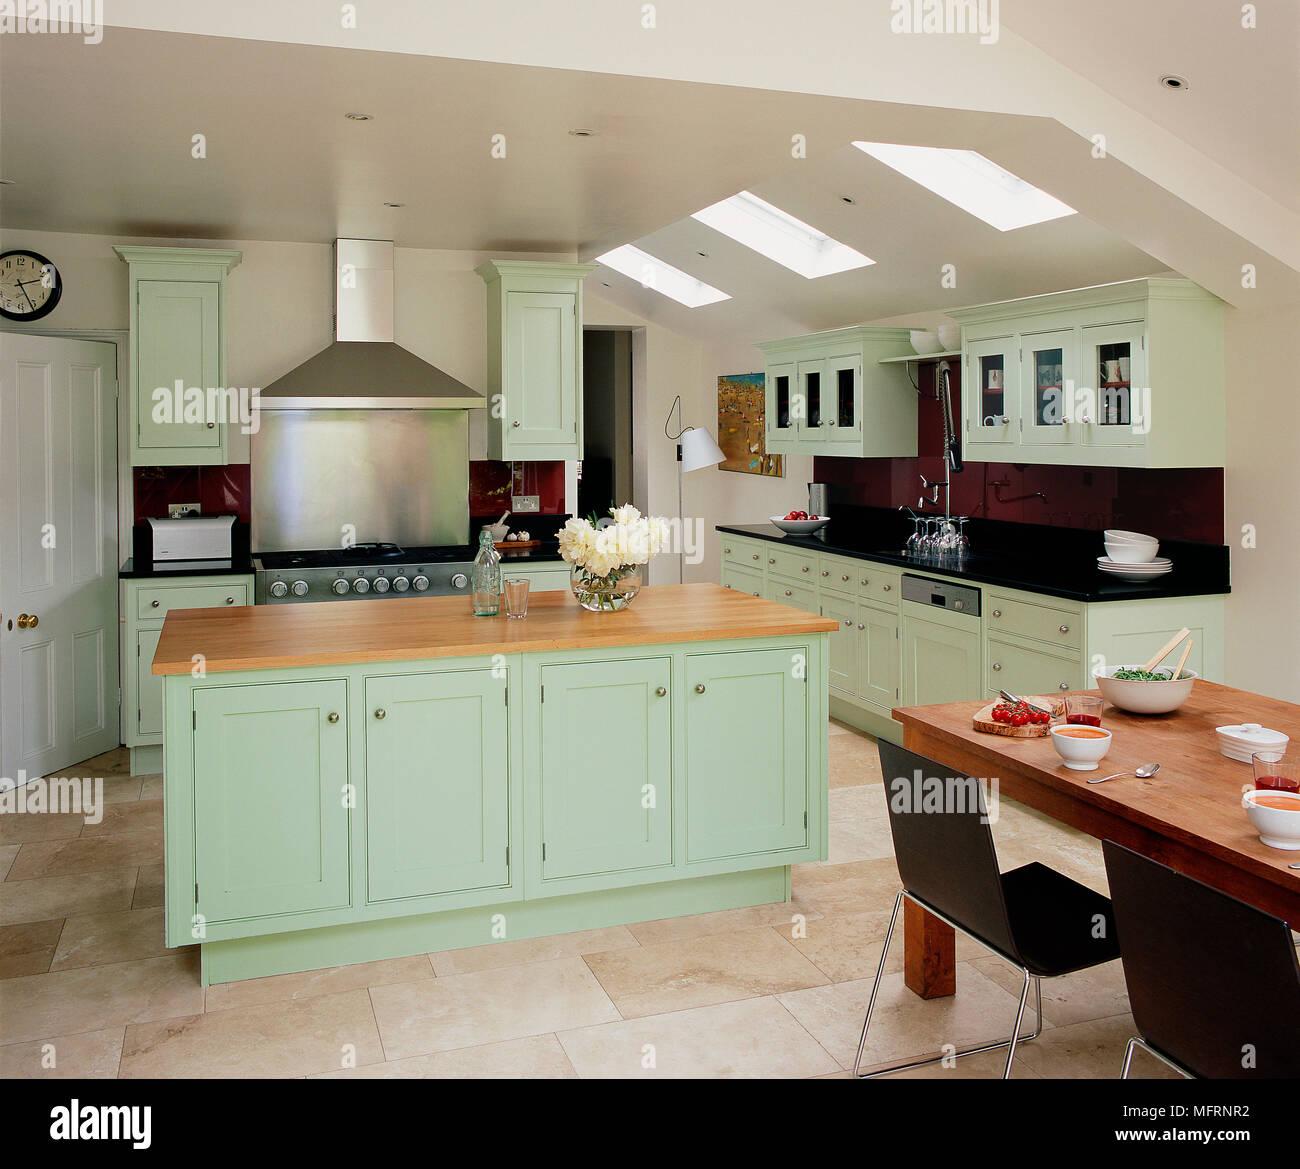 Racconto da pranzo e sedie in moderno stile country con cucina verde ...